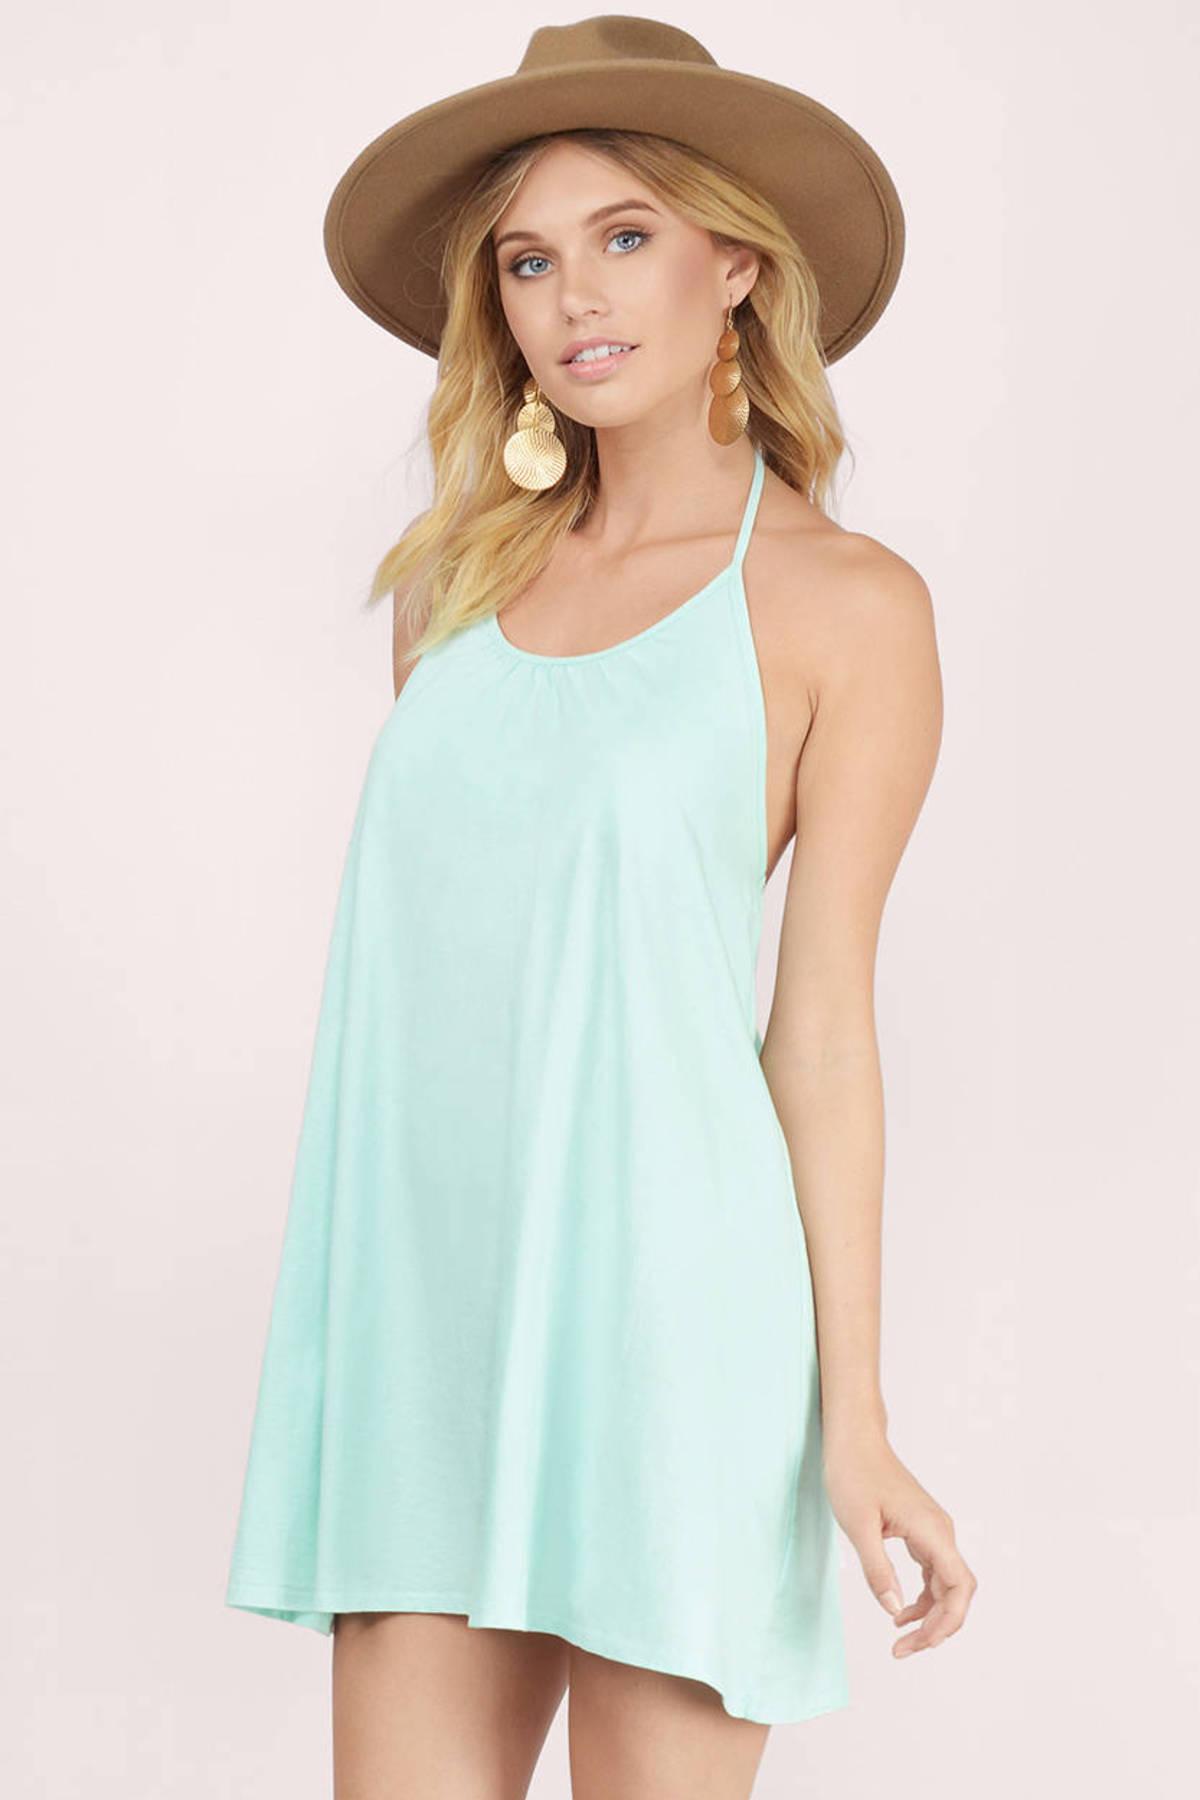 Cute Mint Shift Dress - Backless Dress - Green Dress - $15.00